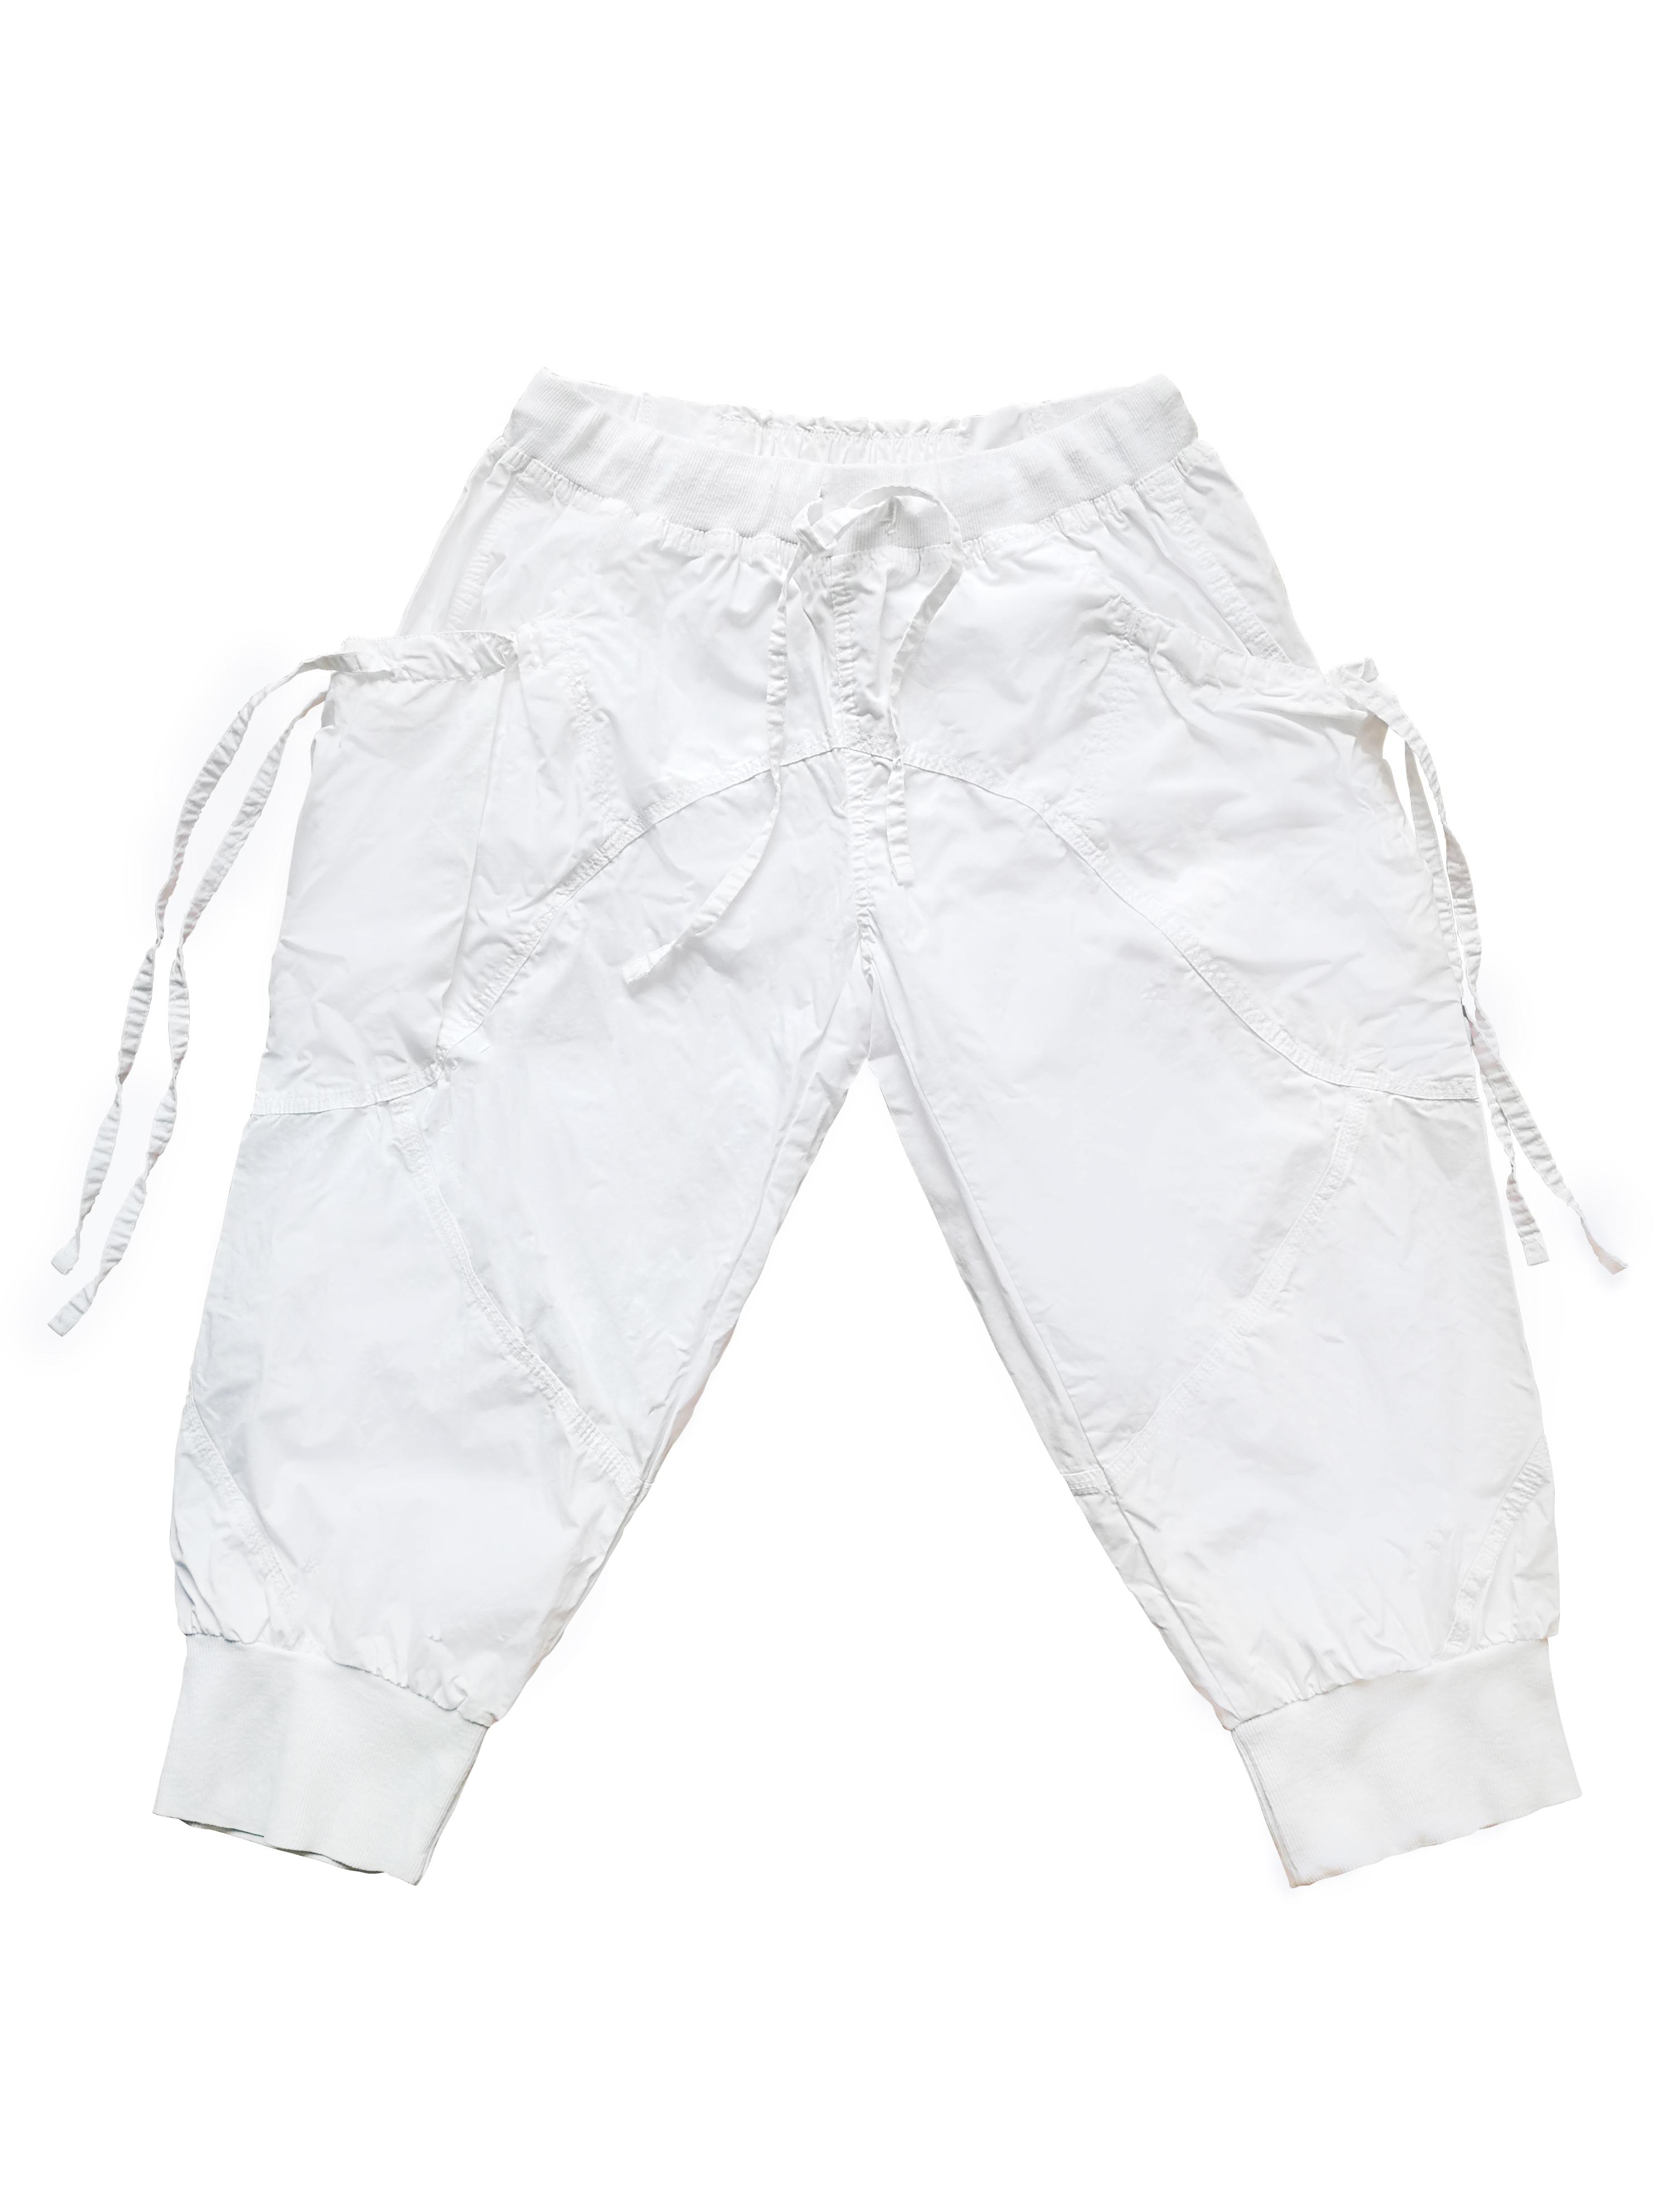 Female white pants 00009